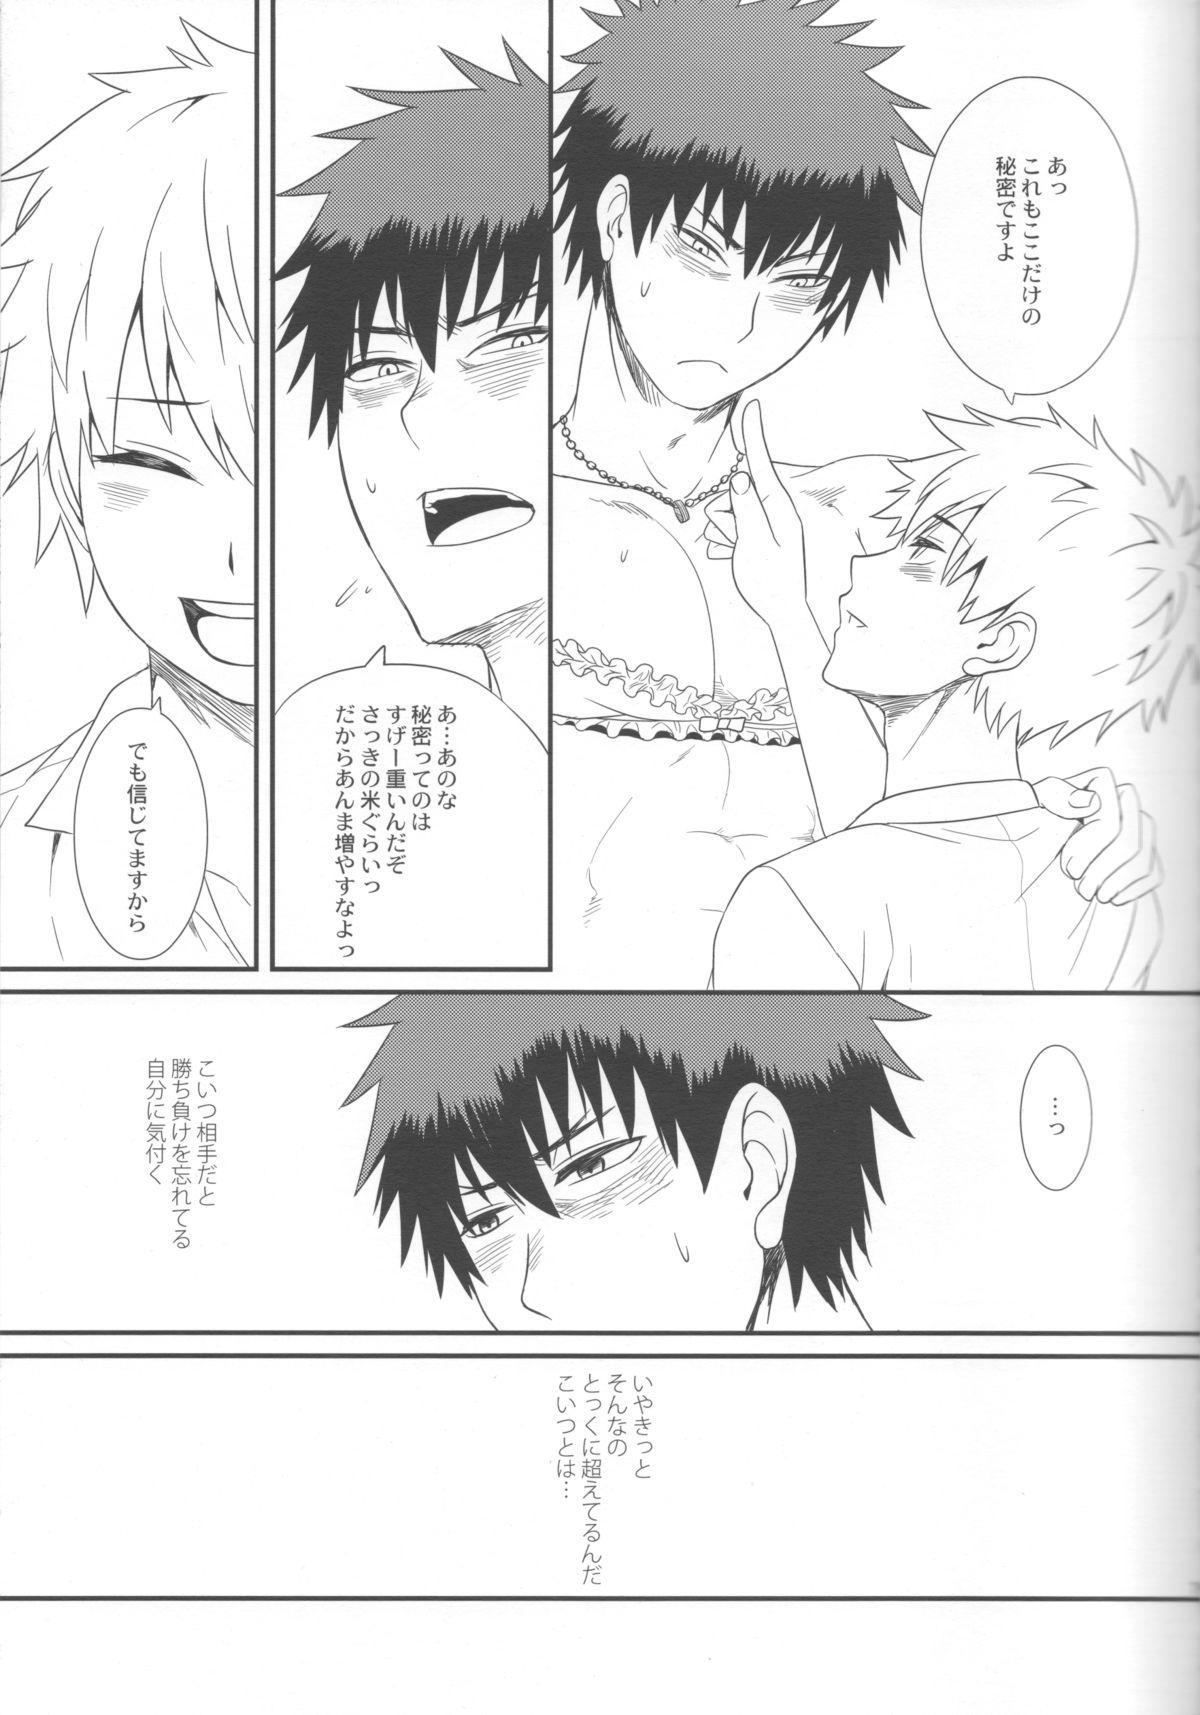 Kuroko to Kagami to Tokidoki Nigou to 17